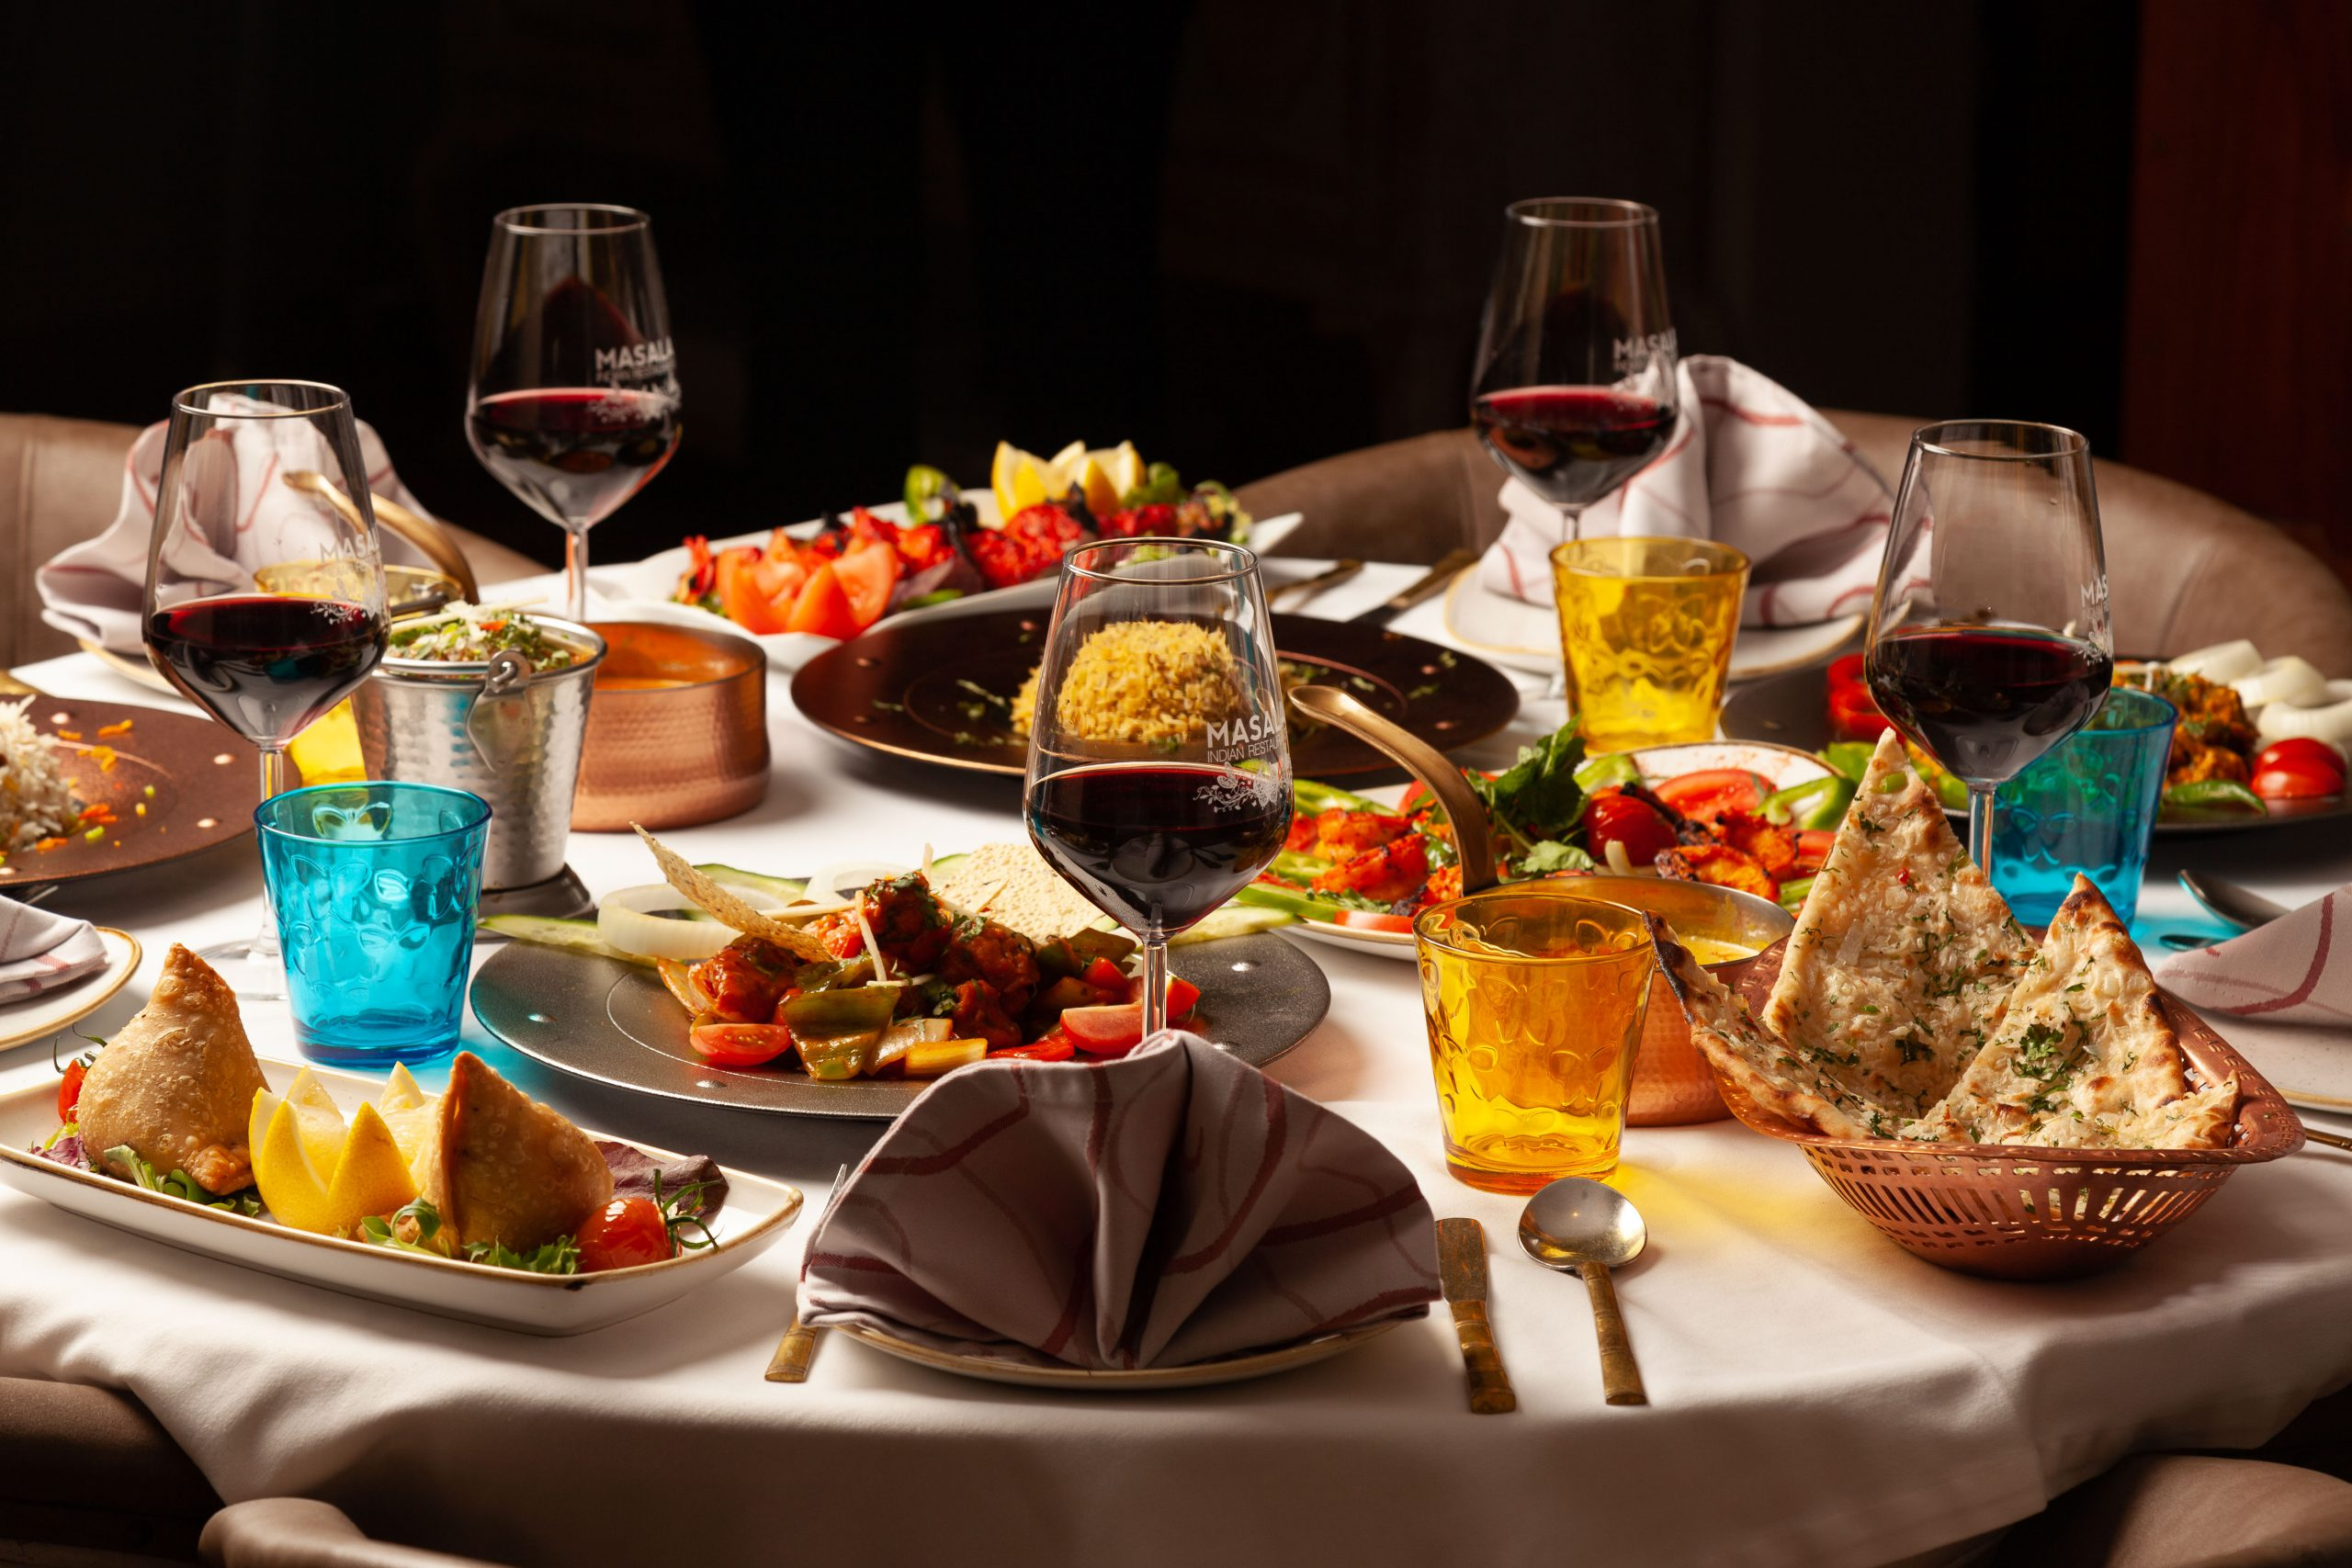 NARAN-HO fotografía comercial - Food Photography